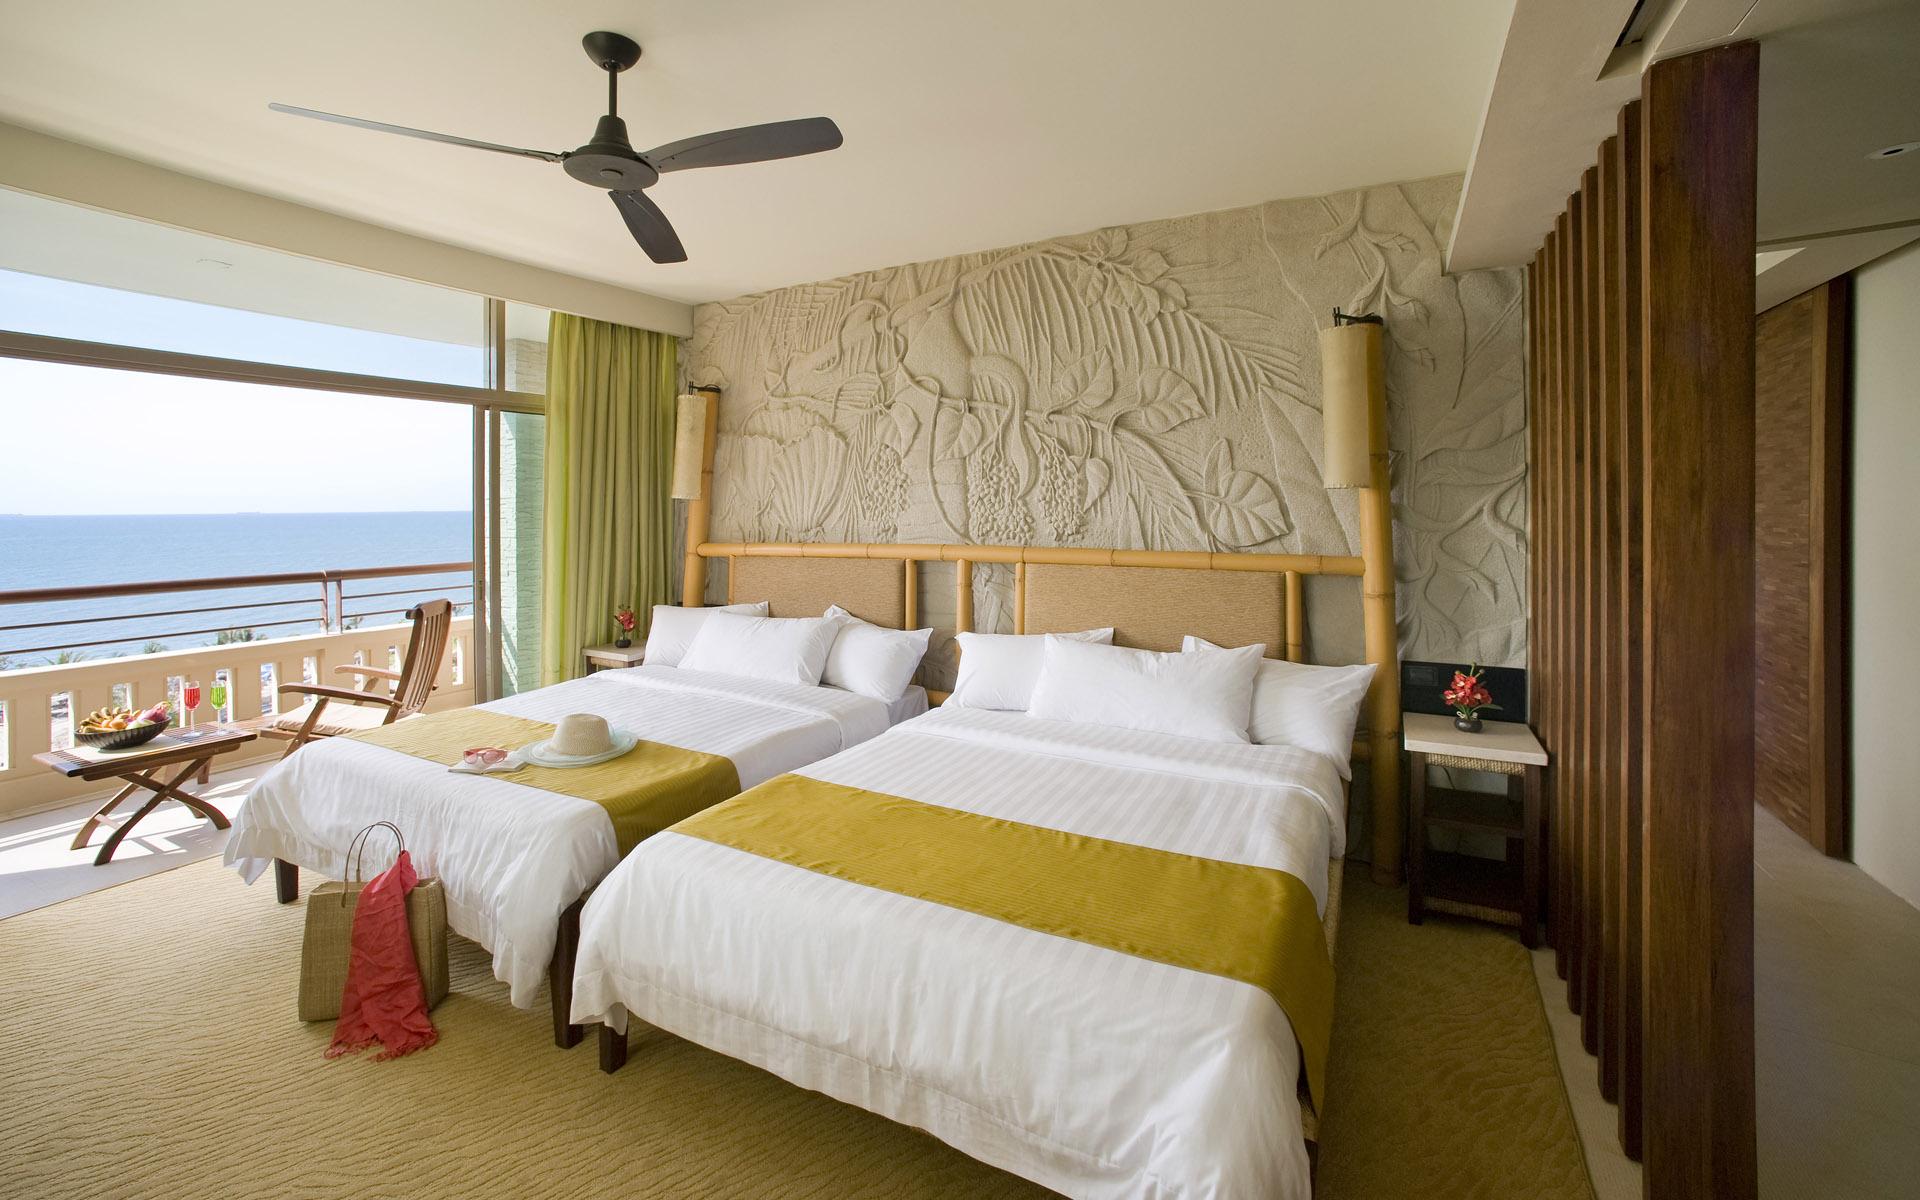 bedroom-interior-design-wallpaper Bedroom interior with balcony design